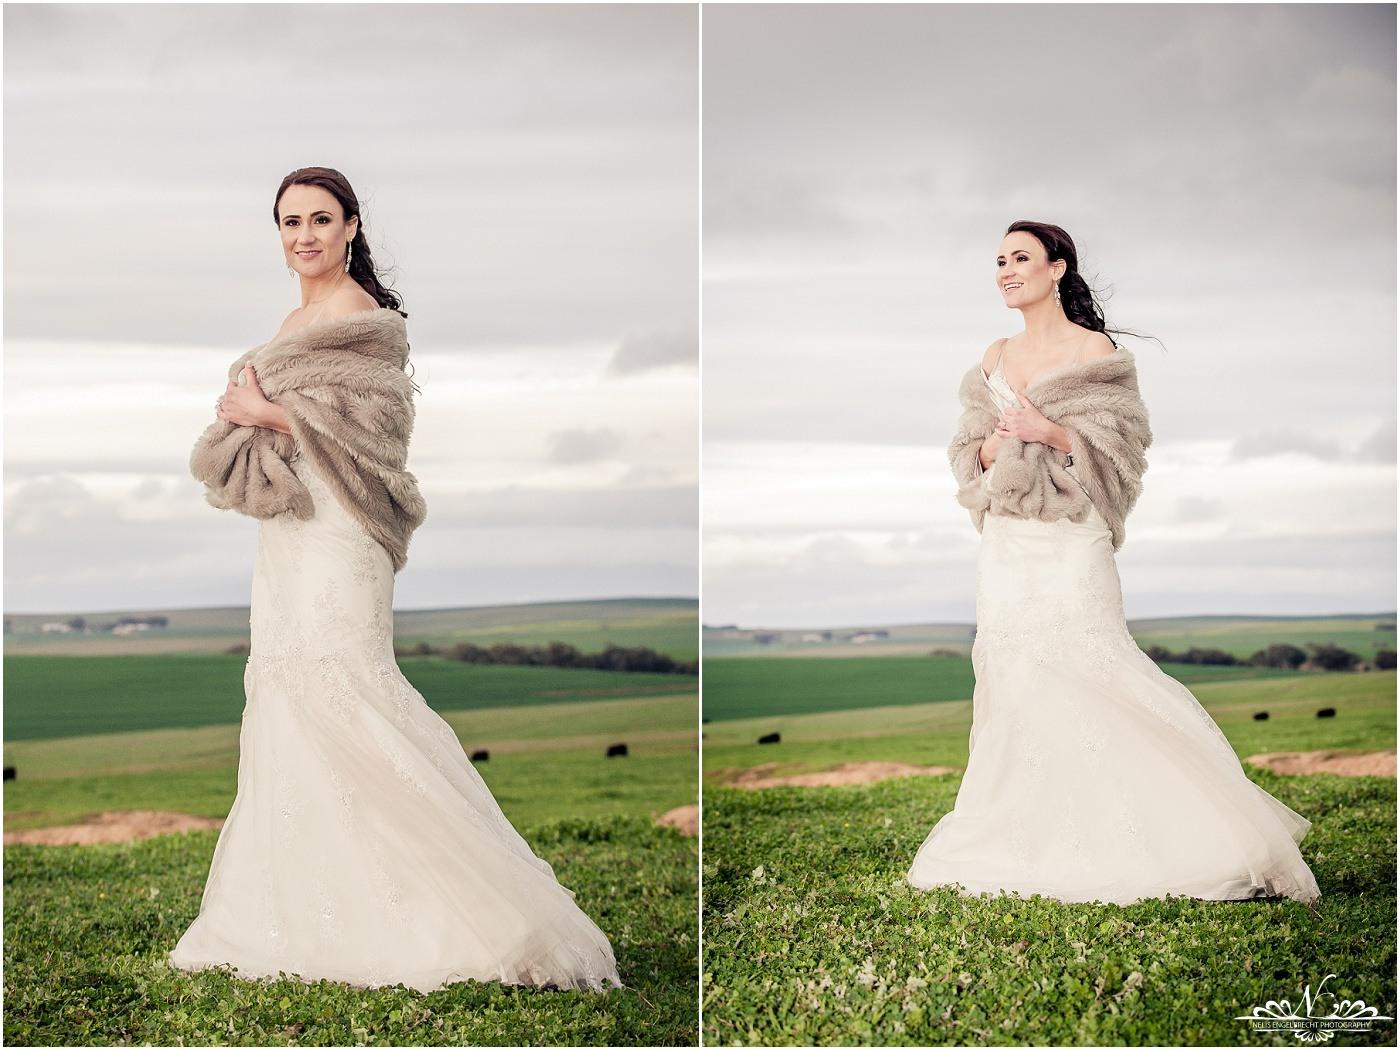 Eensgezind-Wedding-Photos-Nelis-Engelbrecht-Photography-107